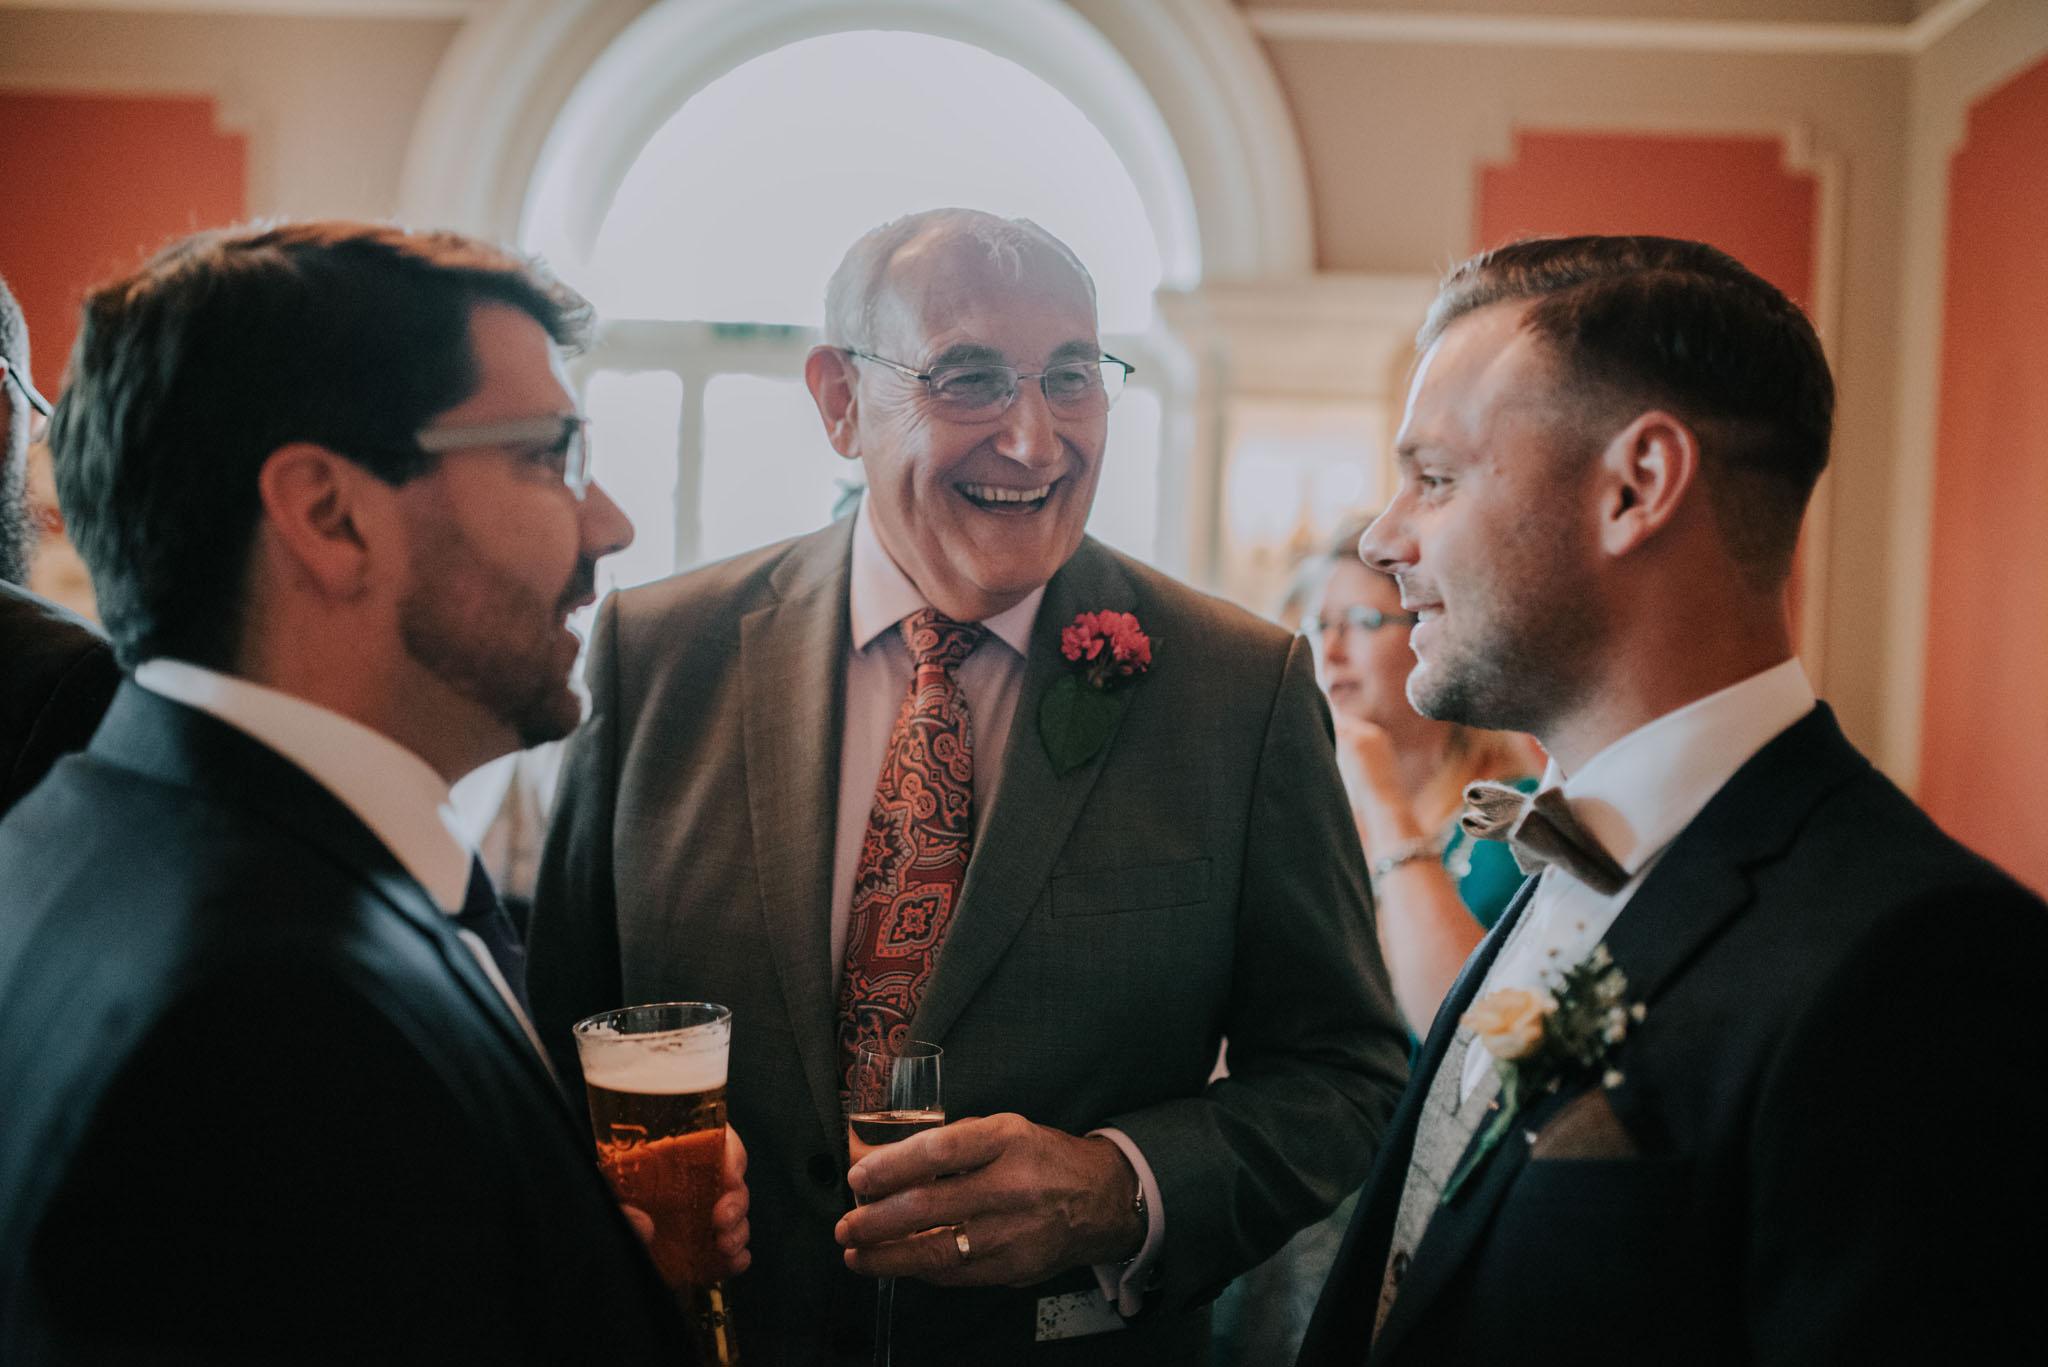 wedding-photographer-glewstone-court-hereford-scott-stockwell-photography322.jpg